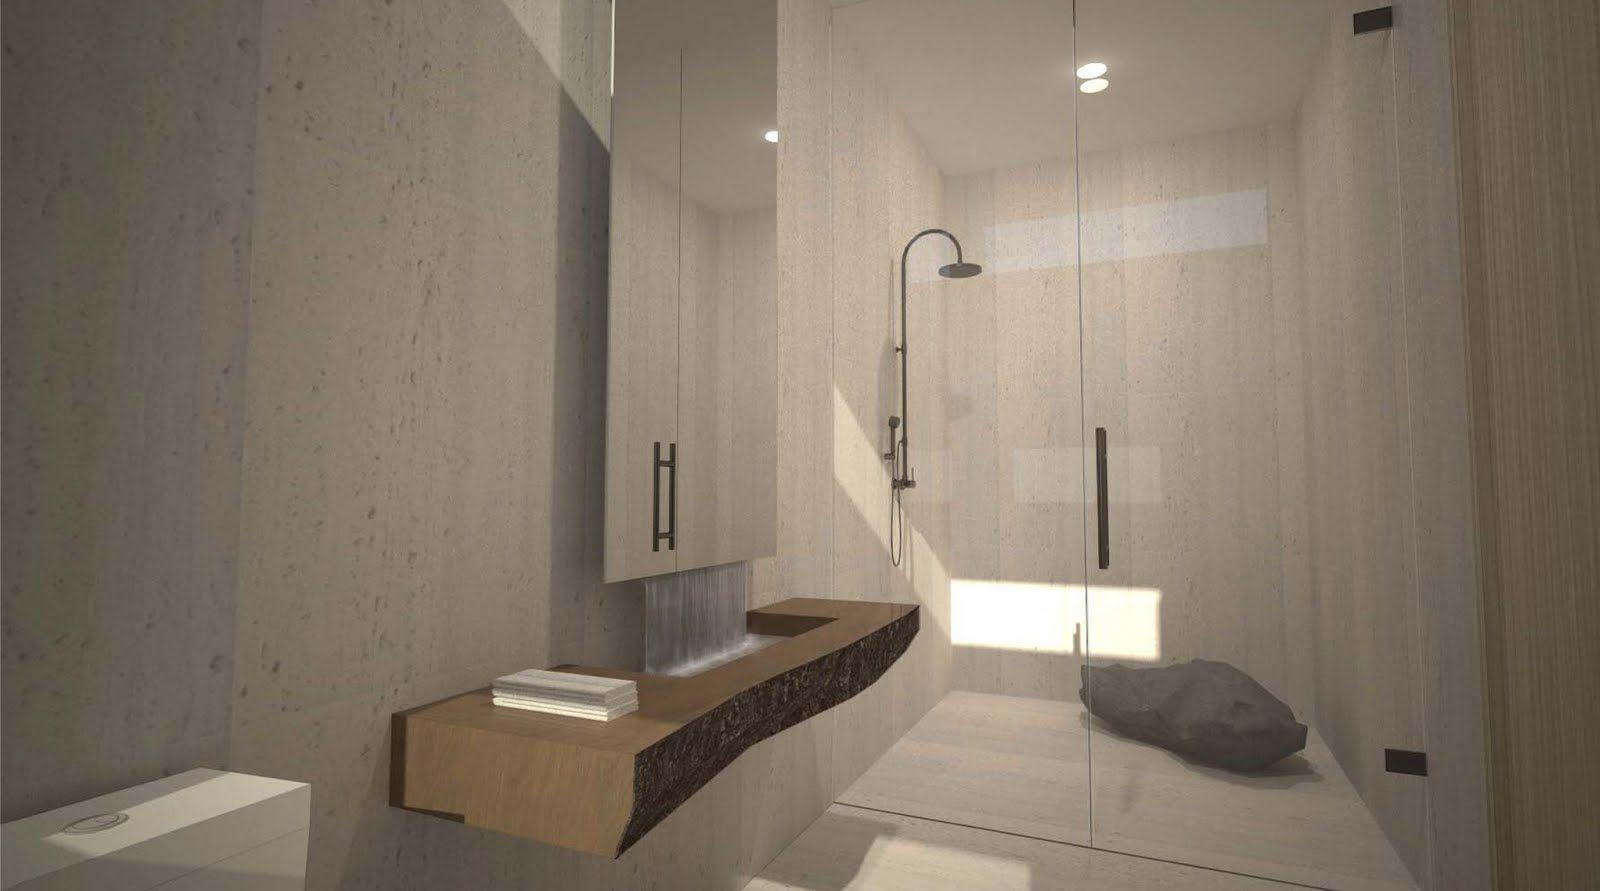 Gym Bathroom Designs  Fitness Centre  Pinterest Alluring Gym Bathroom Designs Decorating Inspiration